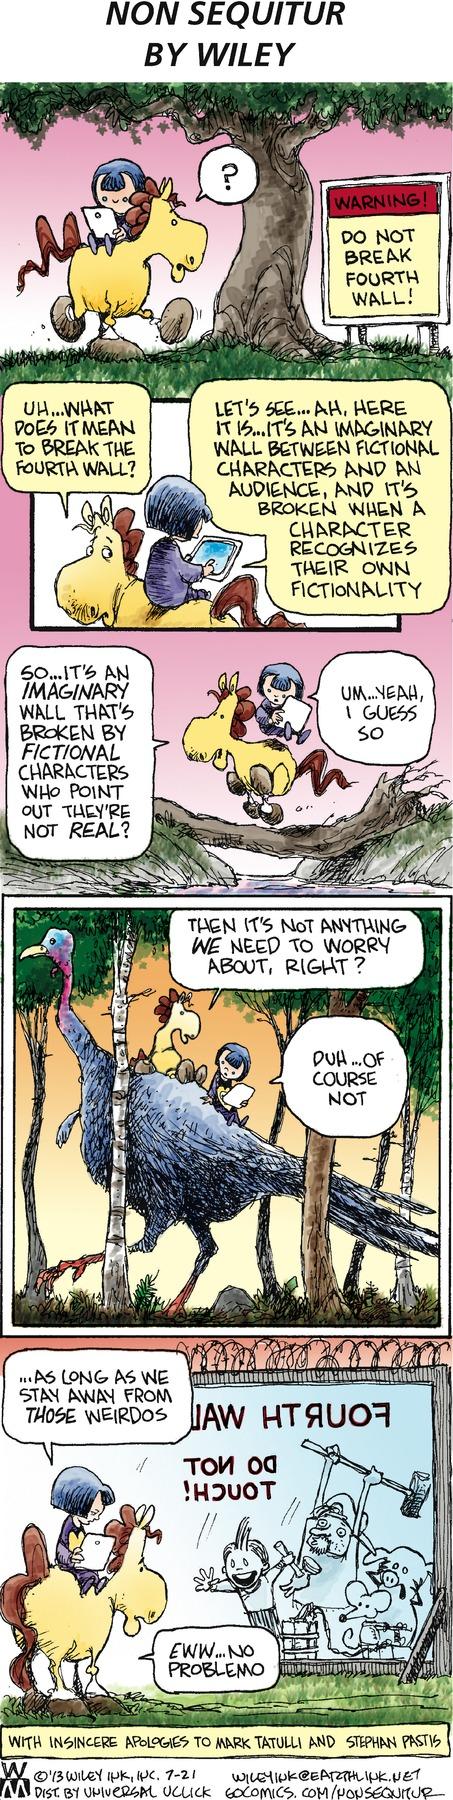 Non Sequitur for Jul 21, 2013 Comic Strip